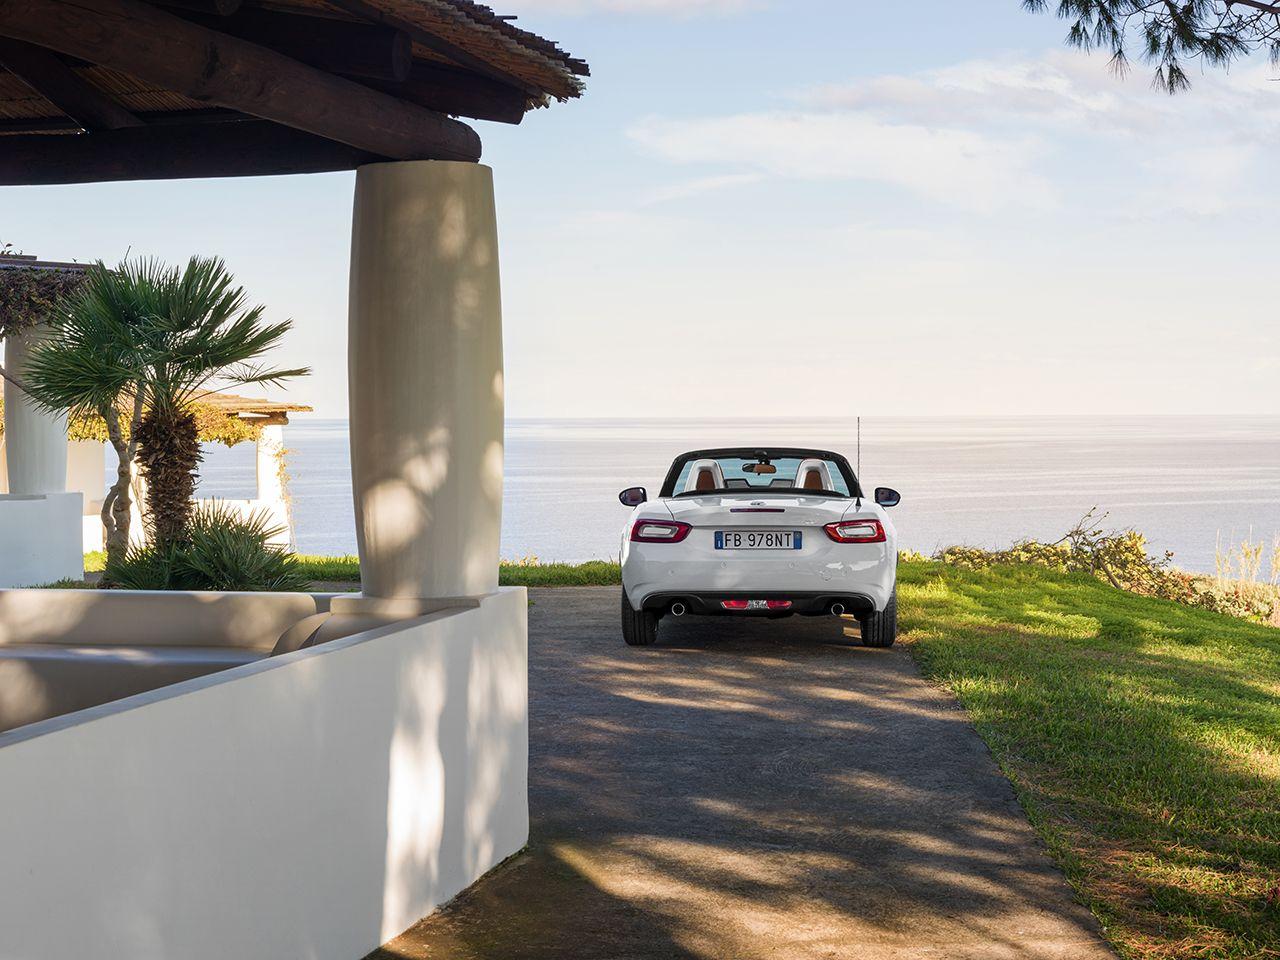 160301 Fiat 124 Spider 14 Άνοιξαν οι παραγγελίες τoυ νέου FIAT 124 Spider στην ελληνική αγορά! cabrio, Fiat, fiat 124 spider, Roadster, αγορά